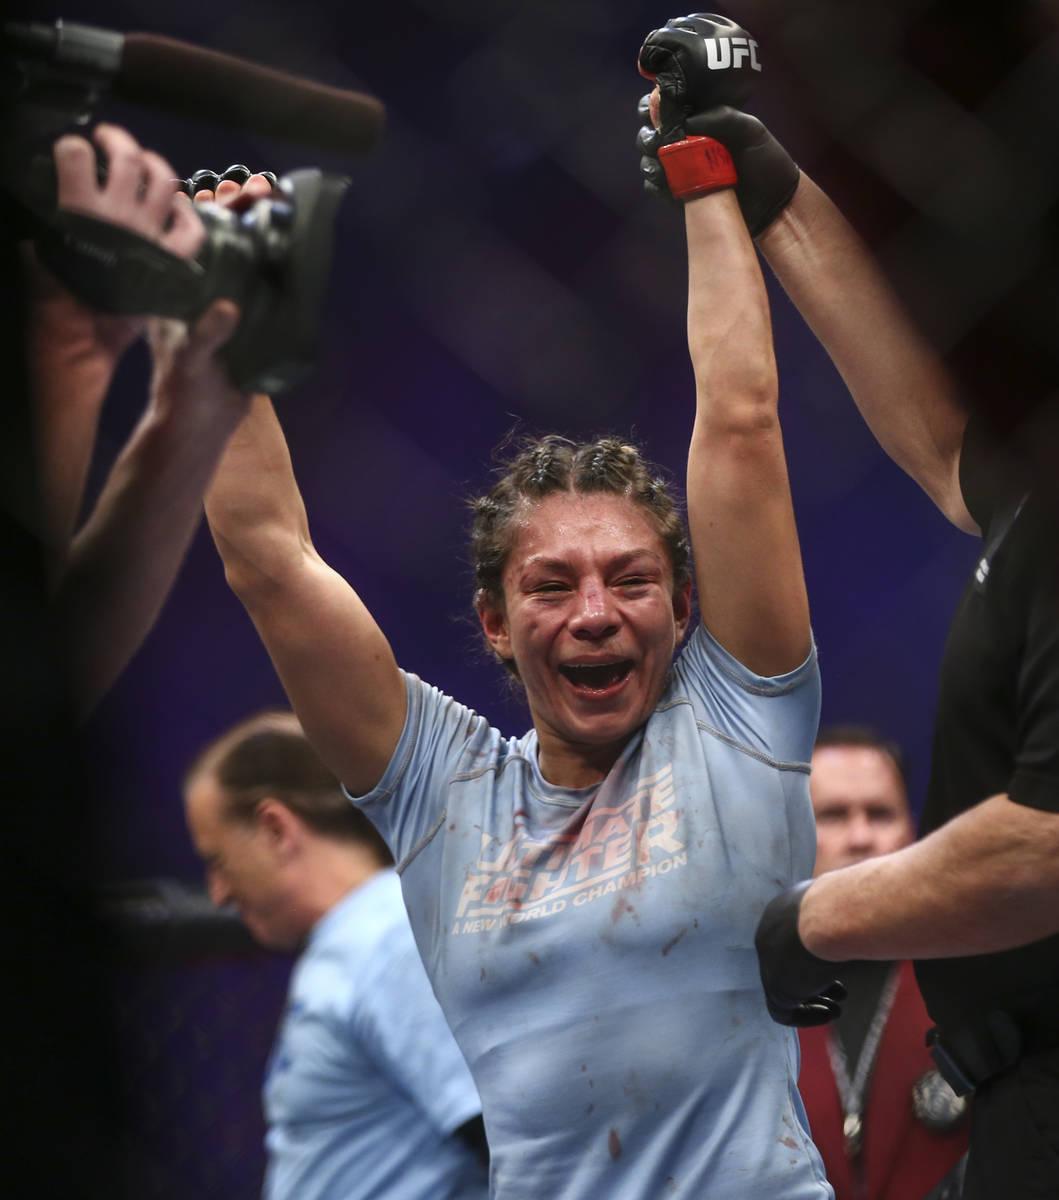 Nicco Montano celebrates after defeating Roxanne Modafferi via unanimous decision in a women's ...